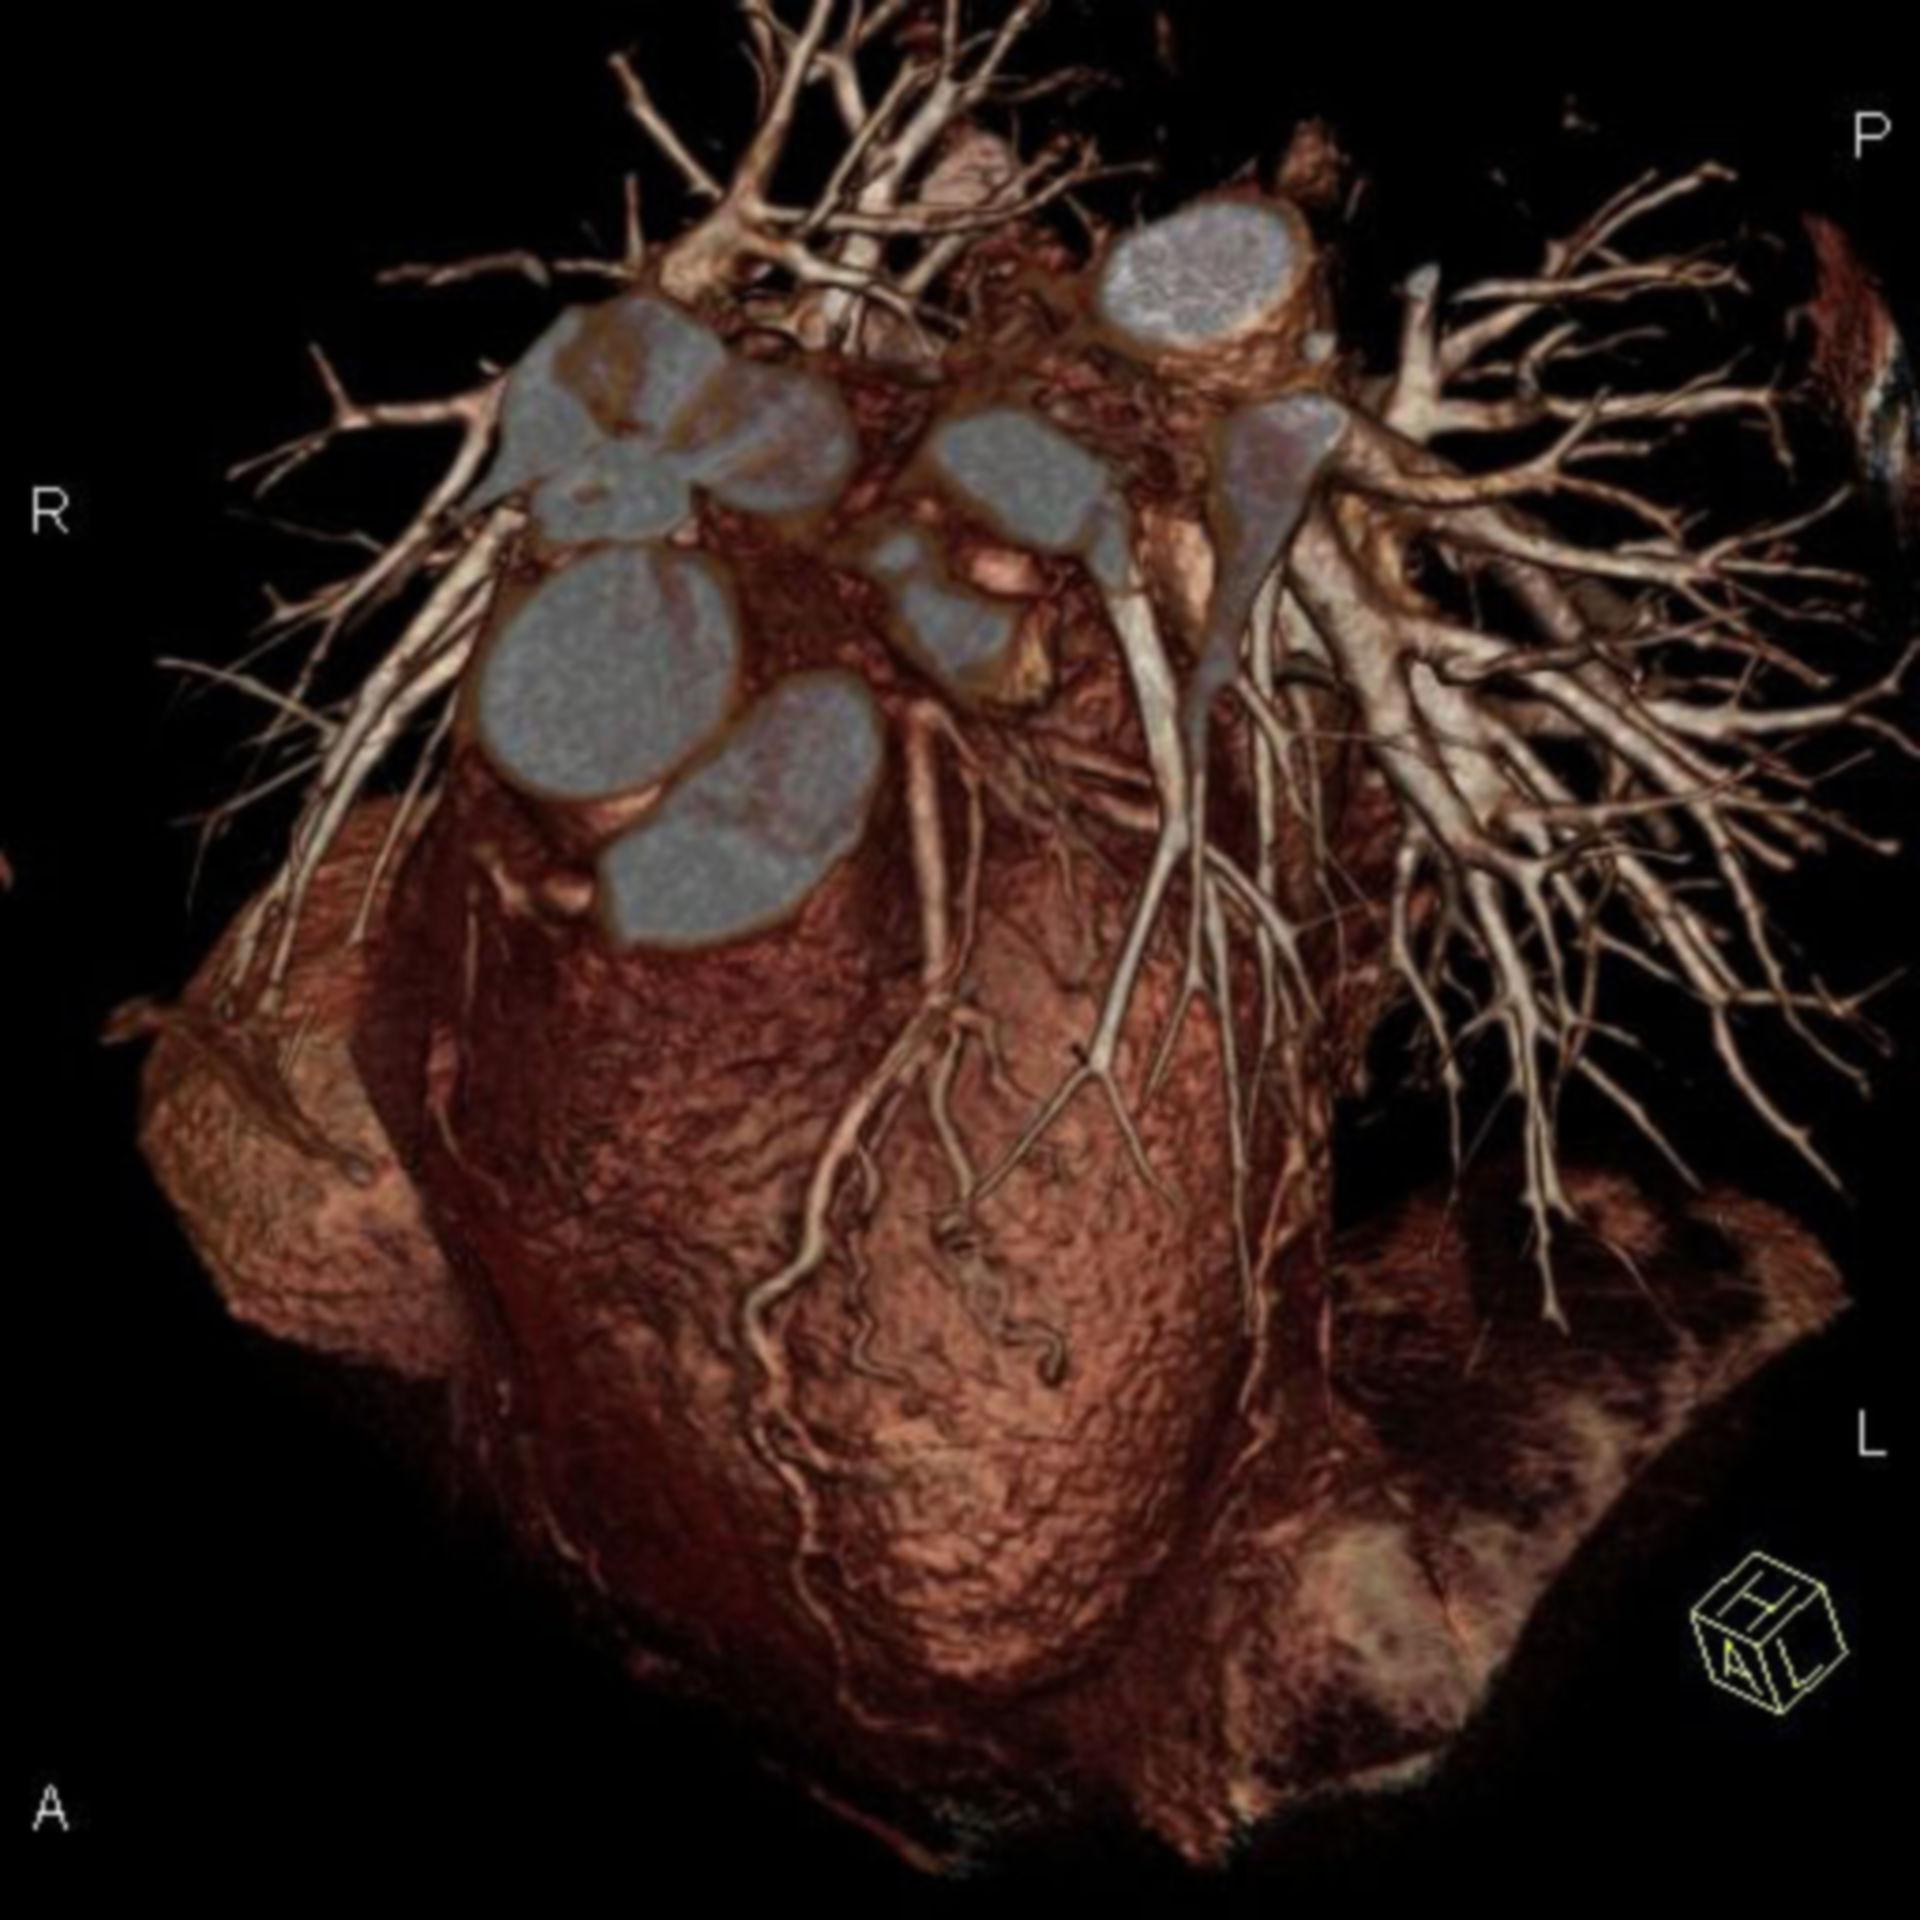 Heart reconstruction